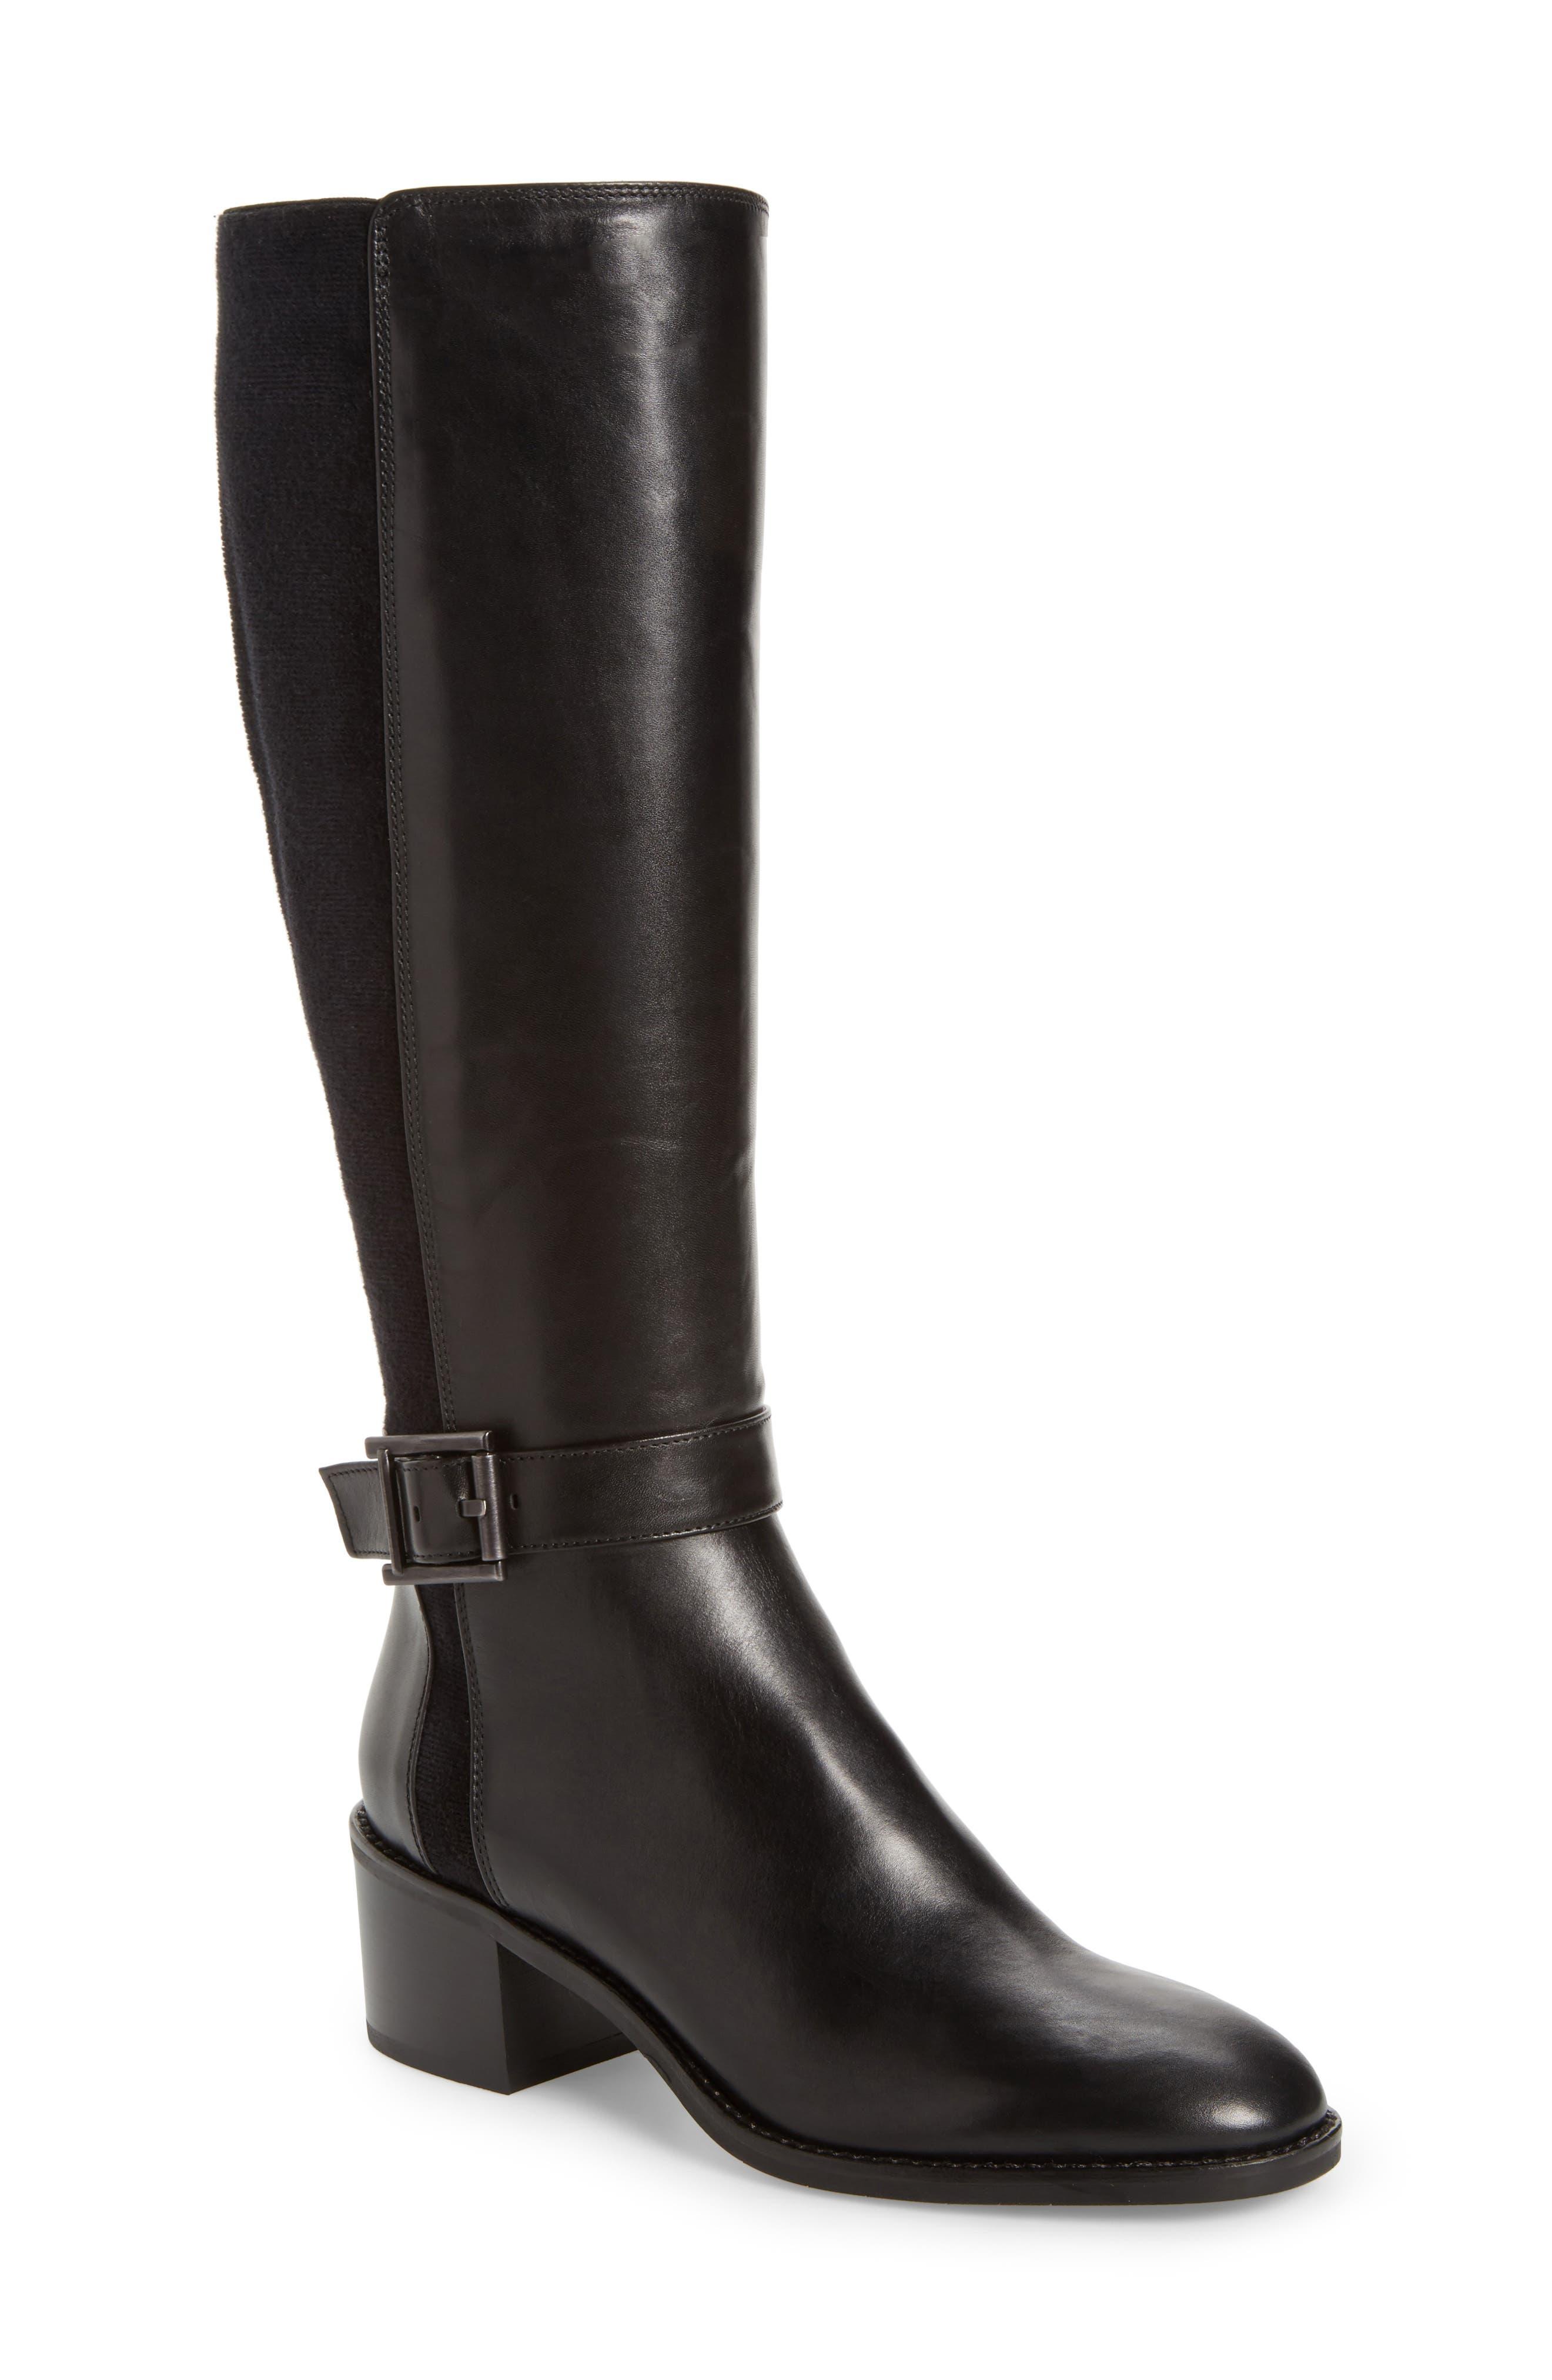 Joanna Weatherproof Tall Boot,                             Main thumbnail 1, color,                             001